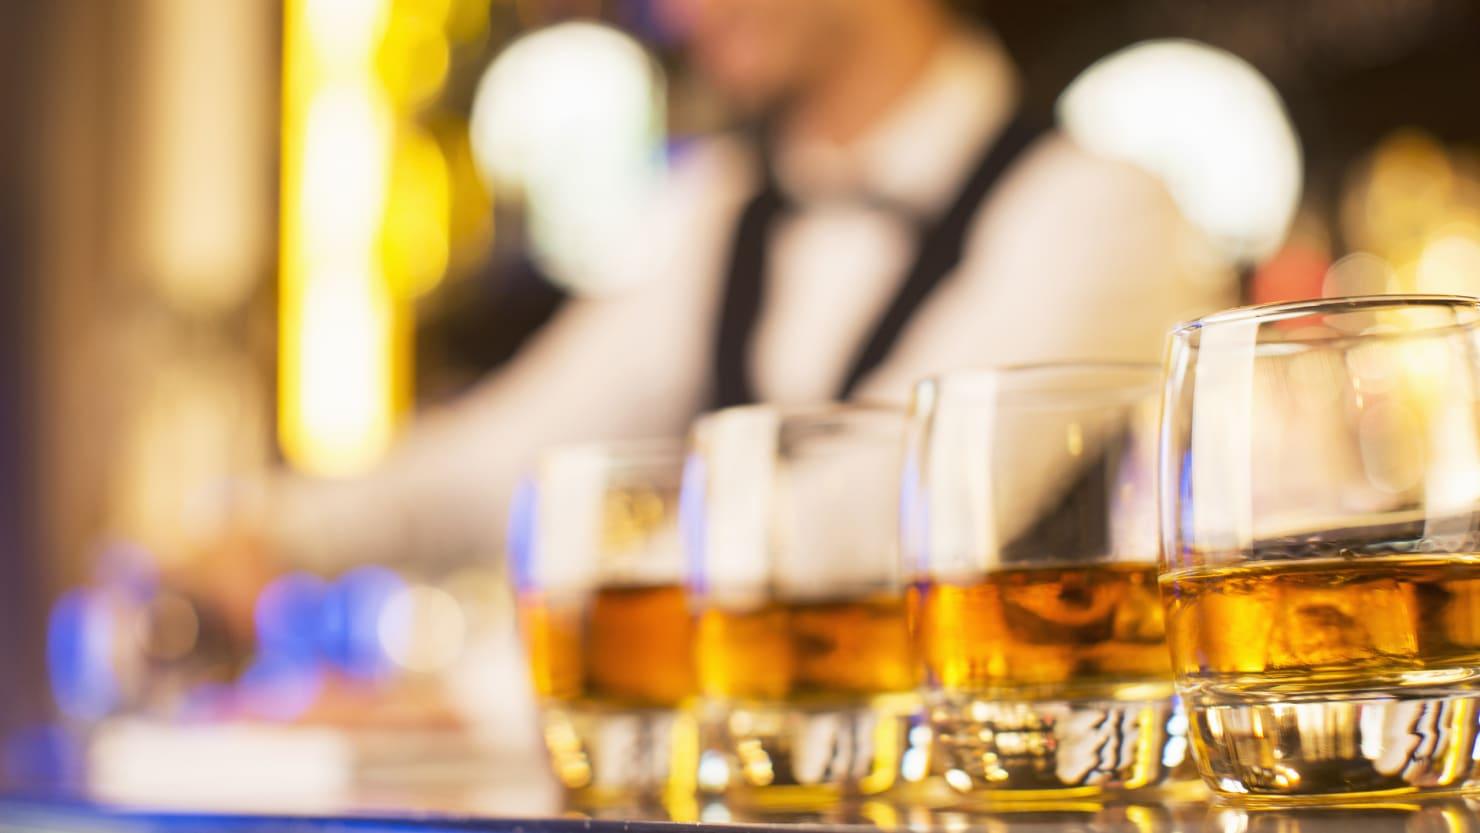 Life Behind Bars Podcast, Bartender Drinks